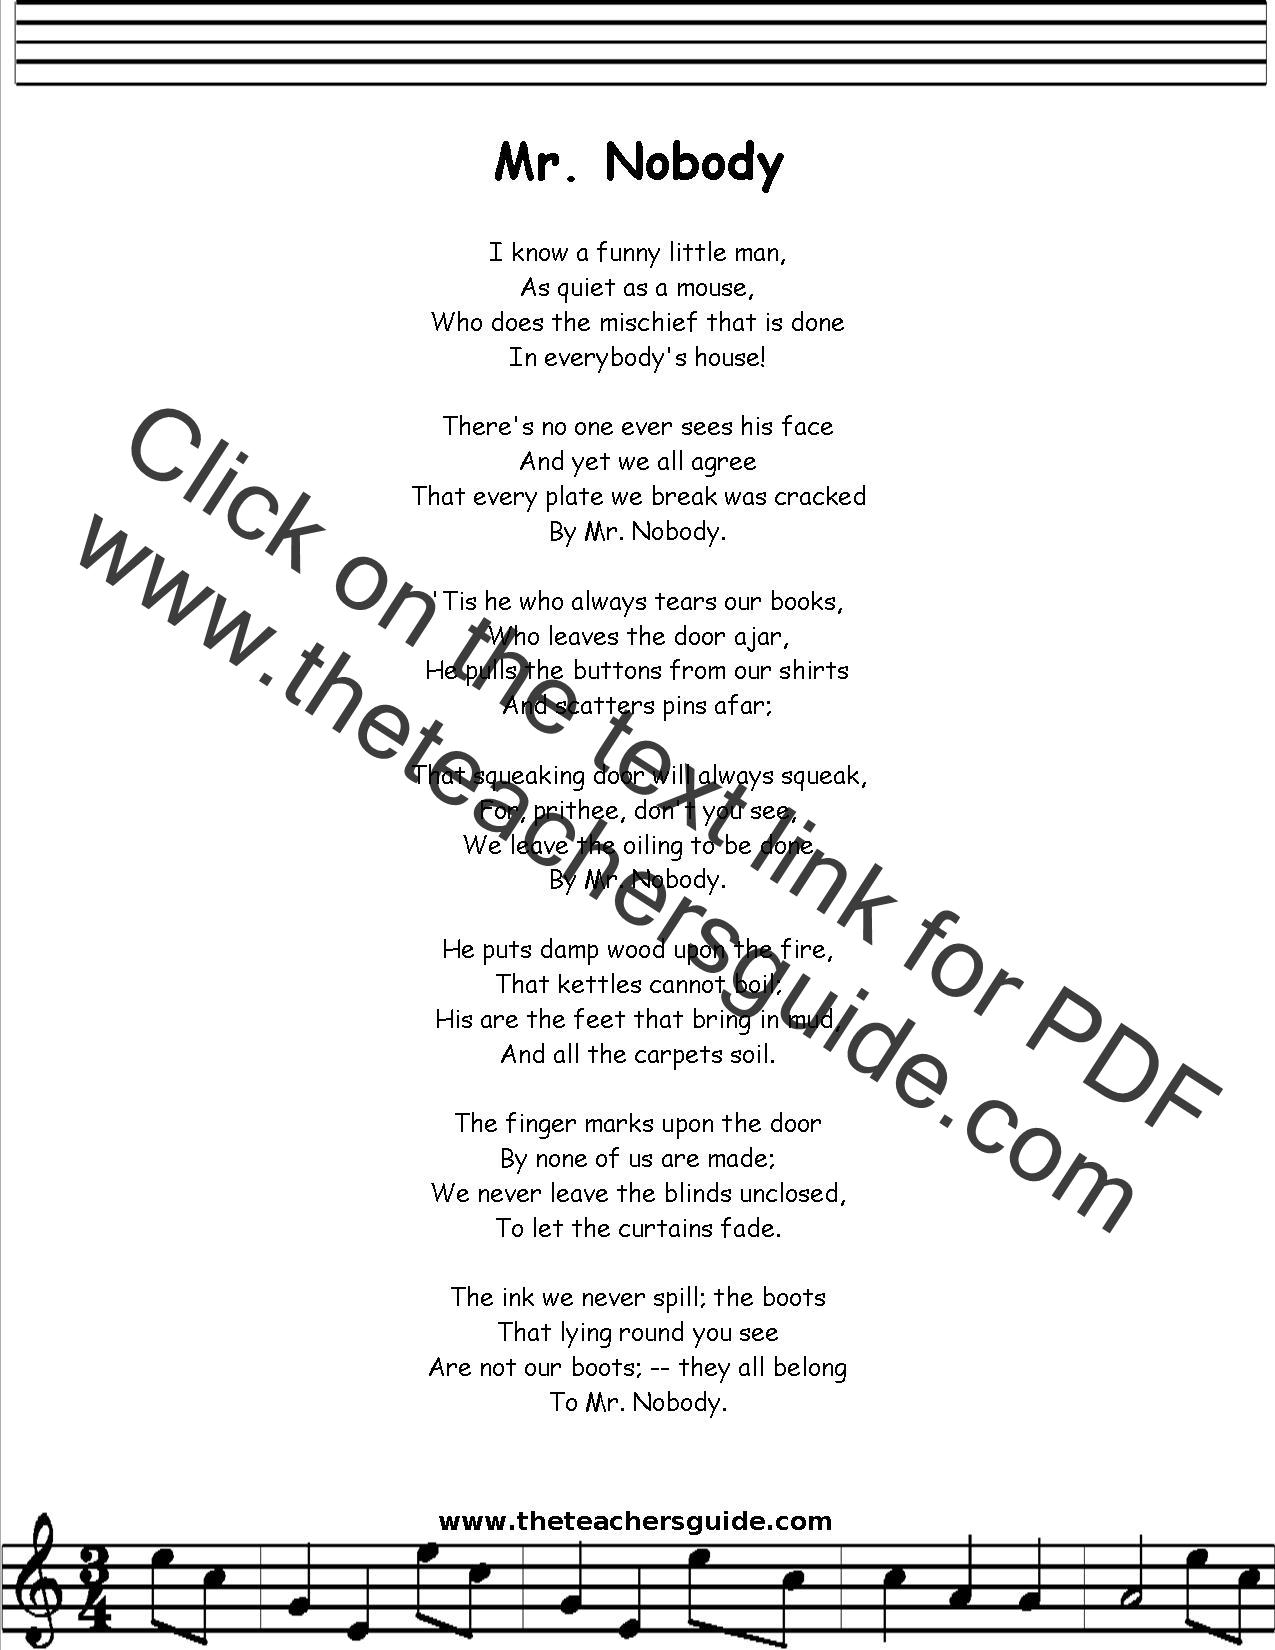 Mr Nobody Lyrics Printout Midi And Video I just can't move my. mr nobody lyrics printout midi and video